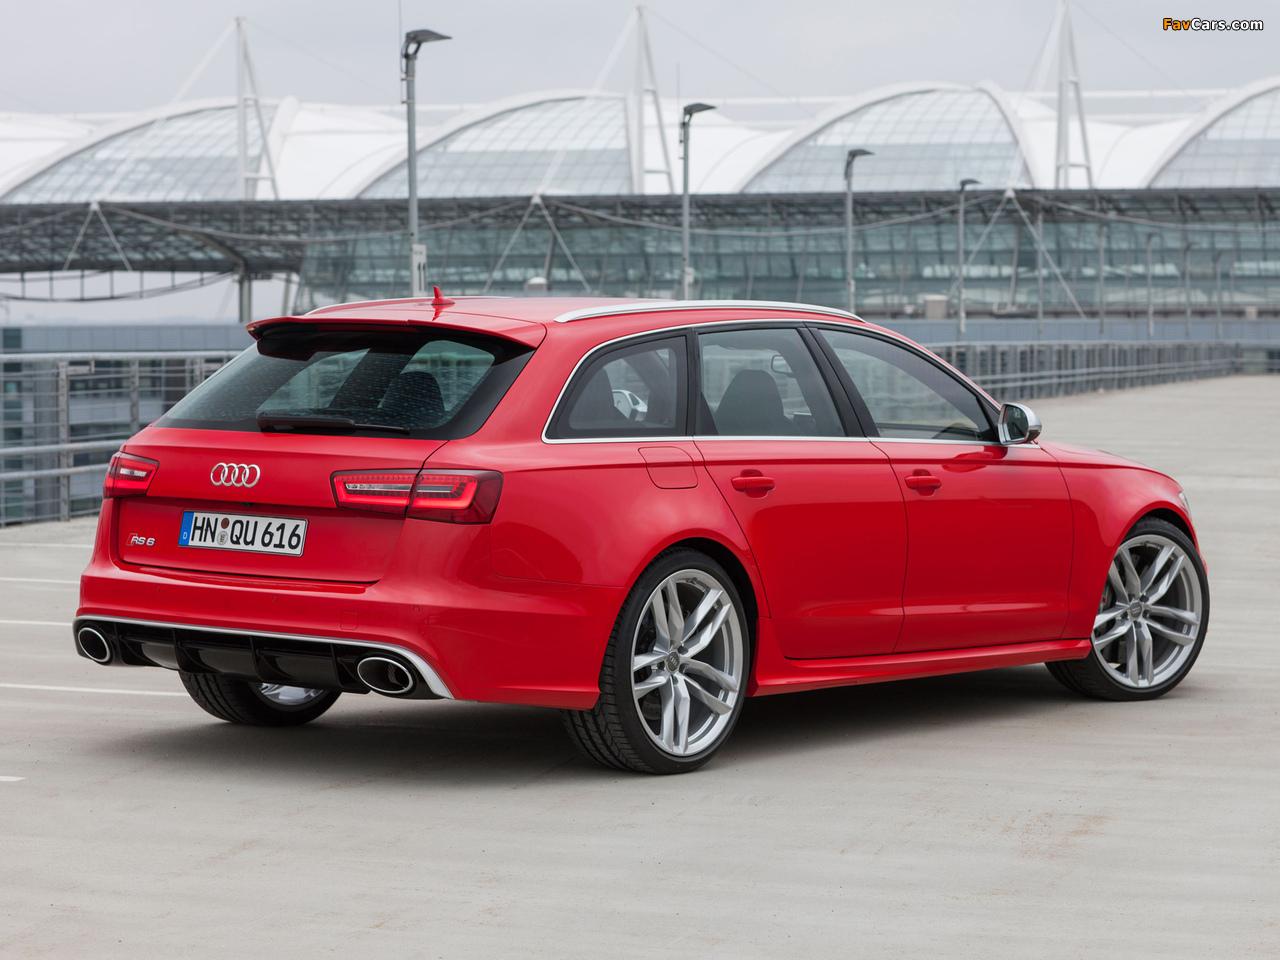 Photos Of Audi Rs6 Avant 4g C7 2013 1280x960